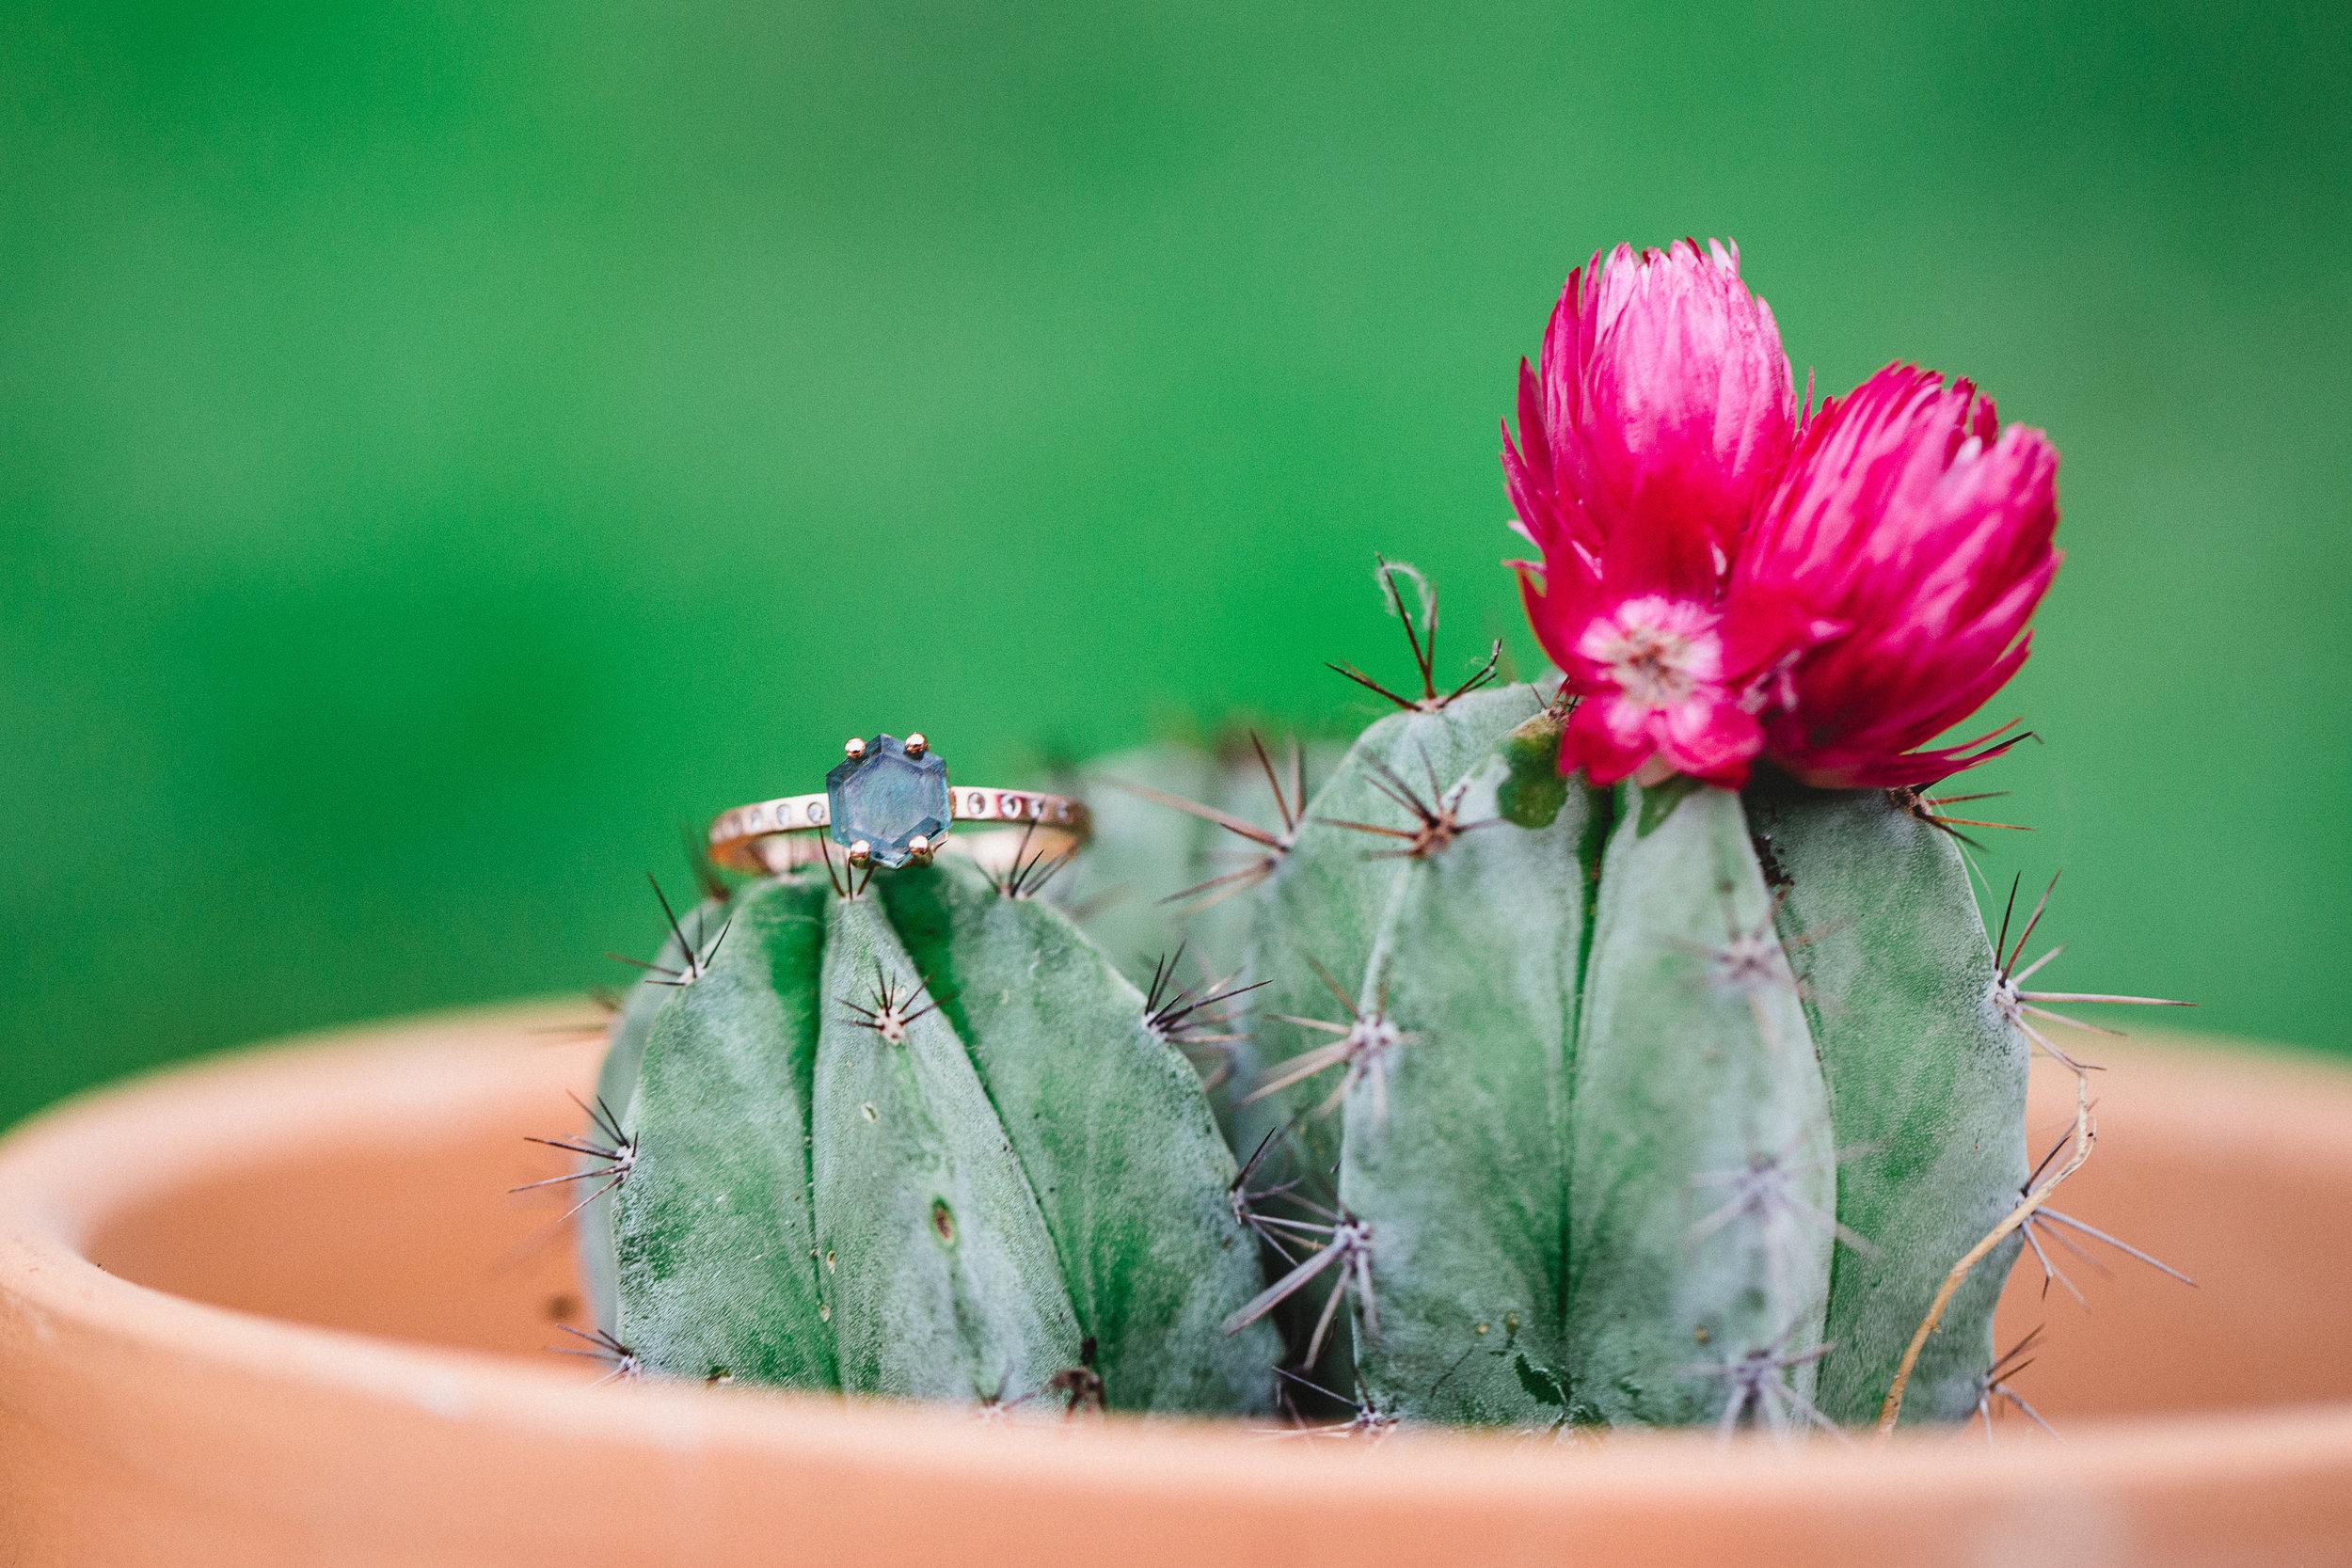 alexis-russell-engagement-ring-ivory-and-beau-savannah-wedding-planner-savannah-event-designer-savannah-engagement-session-old-dairy-farm-wedding.jpg